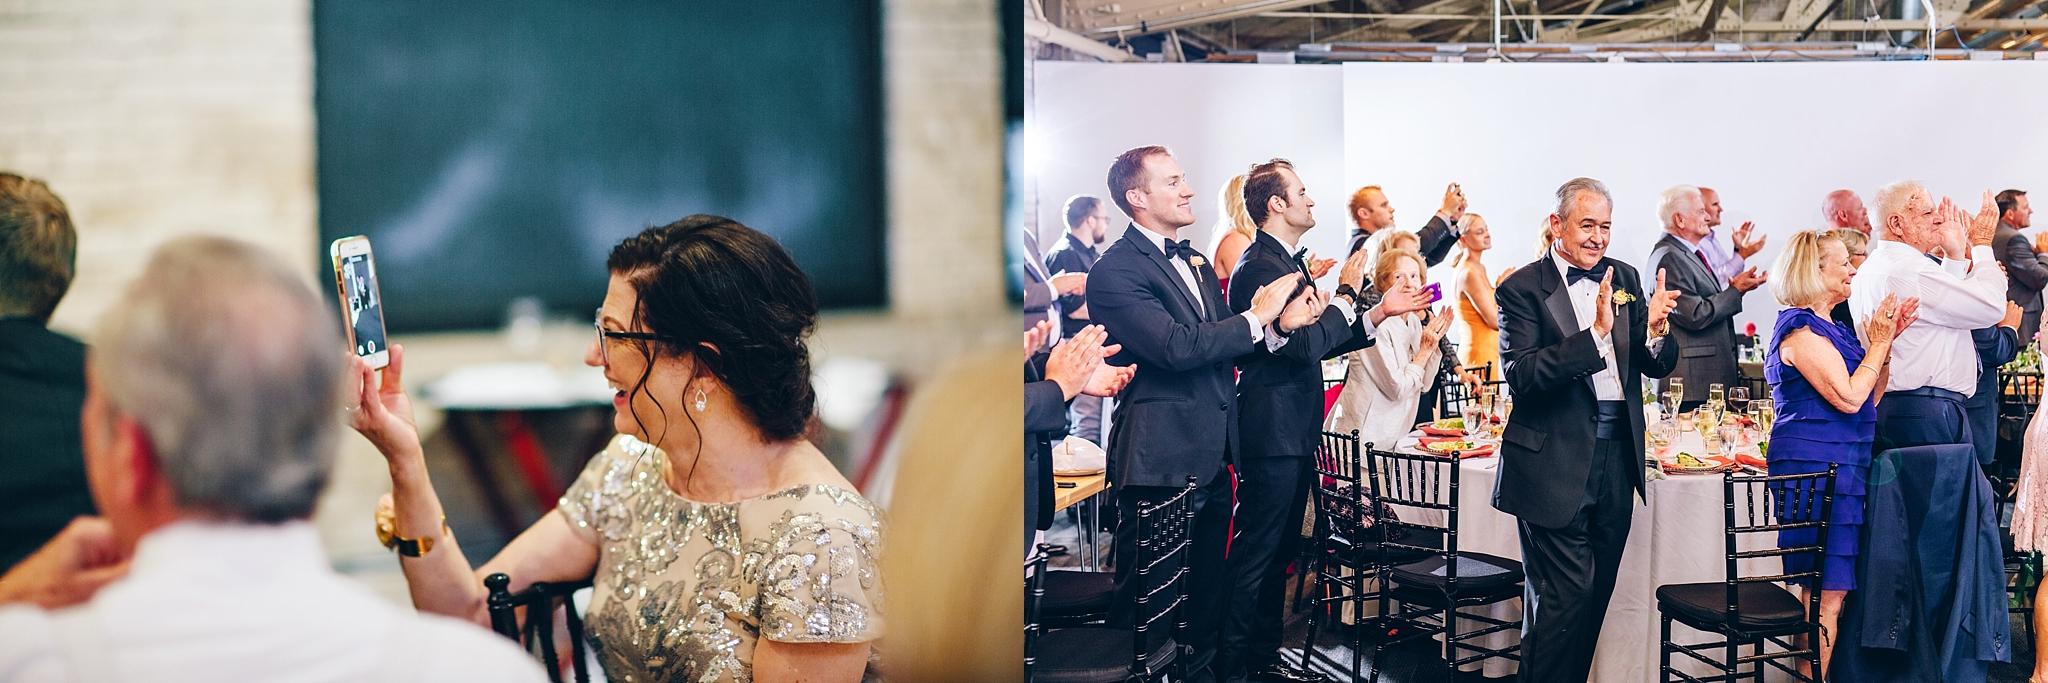 baker-lofts-holland-michigan-wedding-photographer_0392.jpg